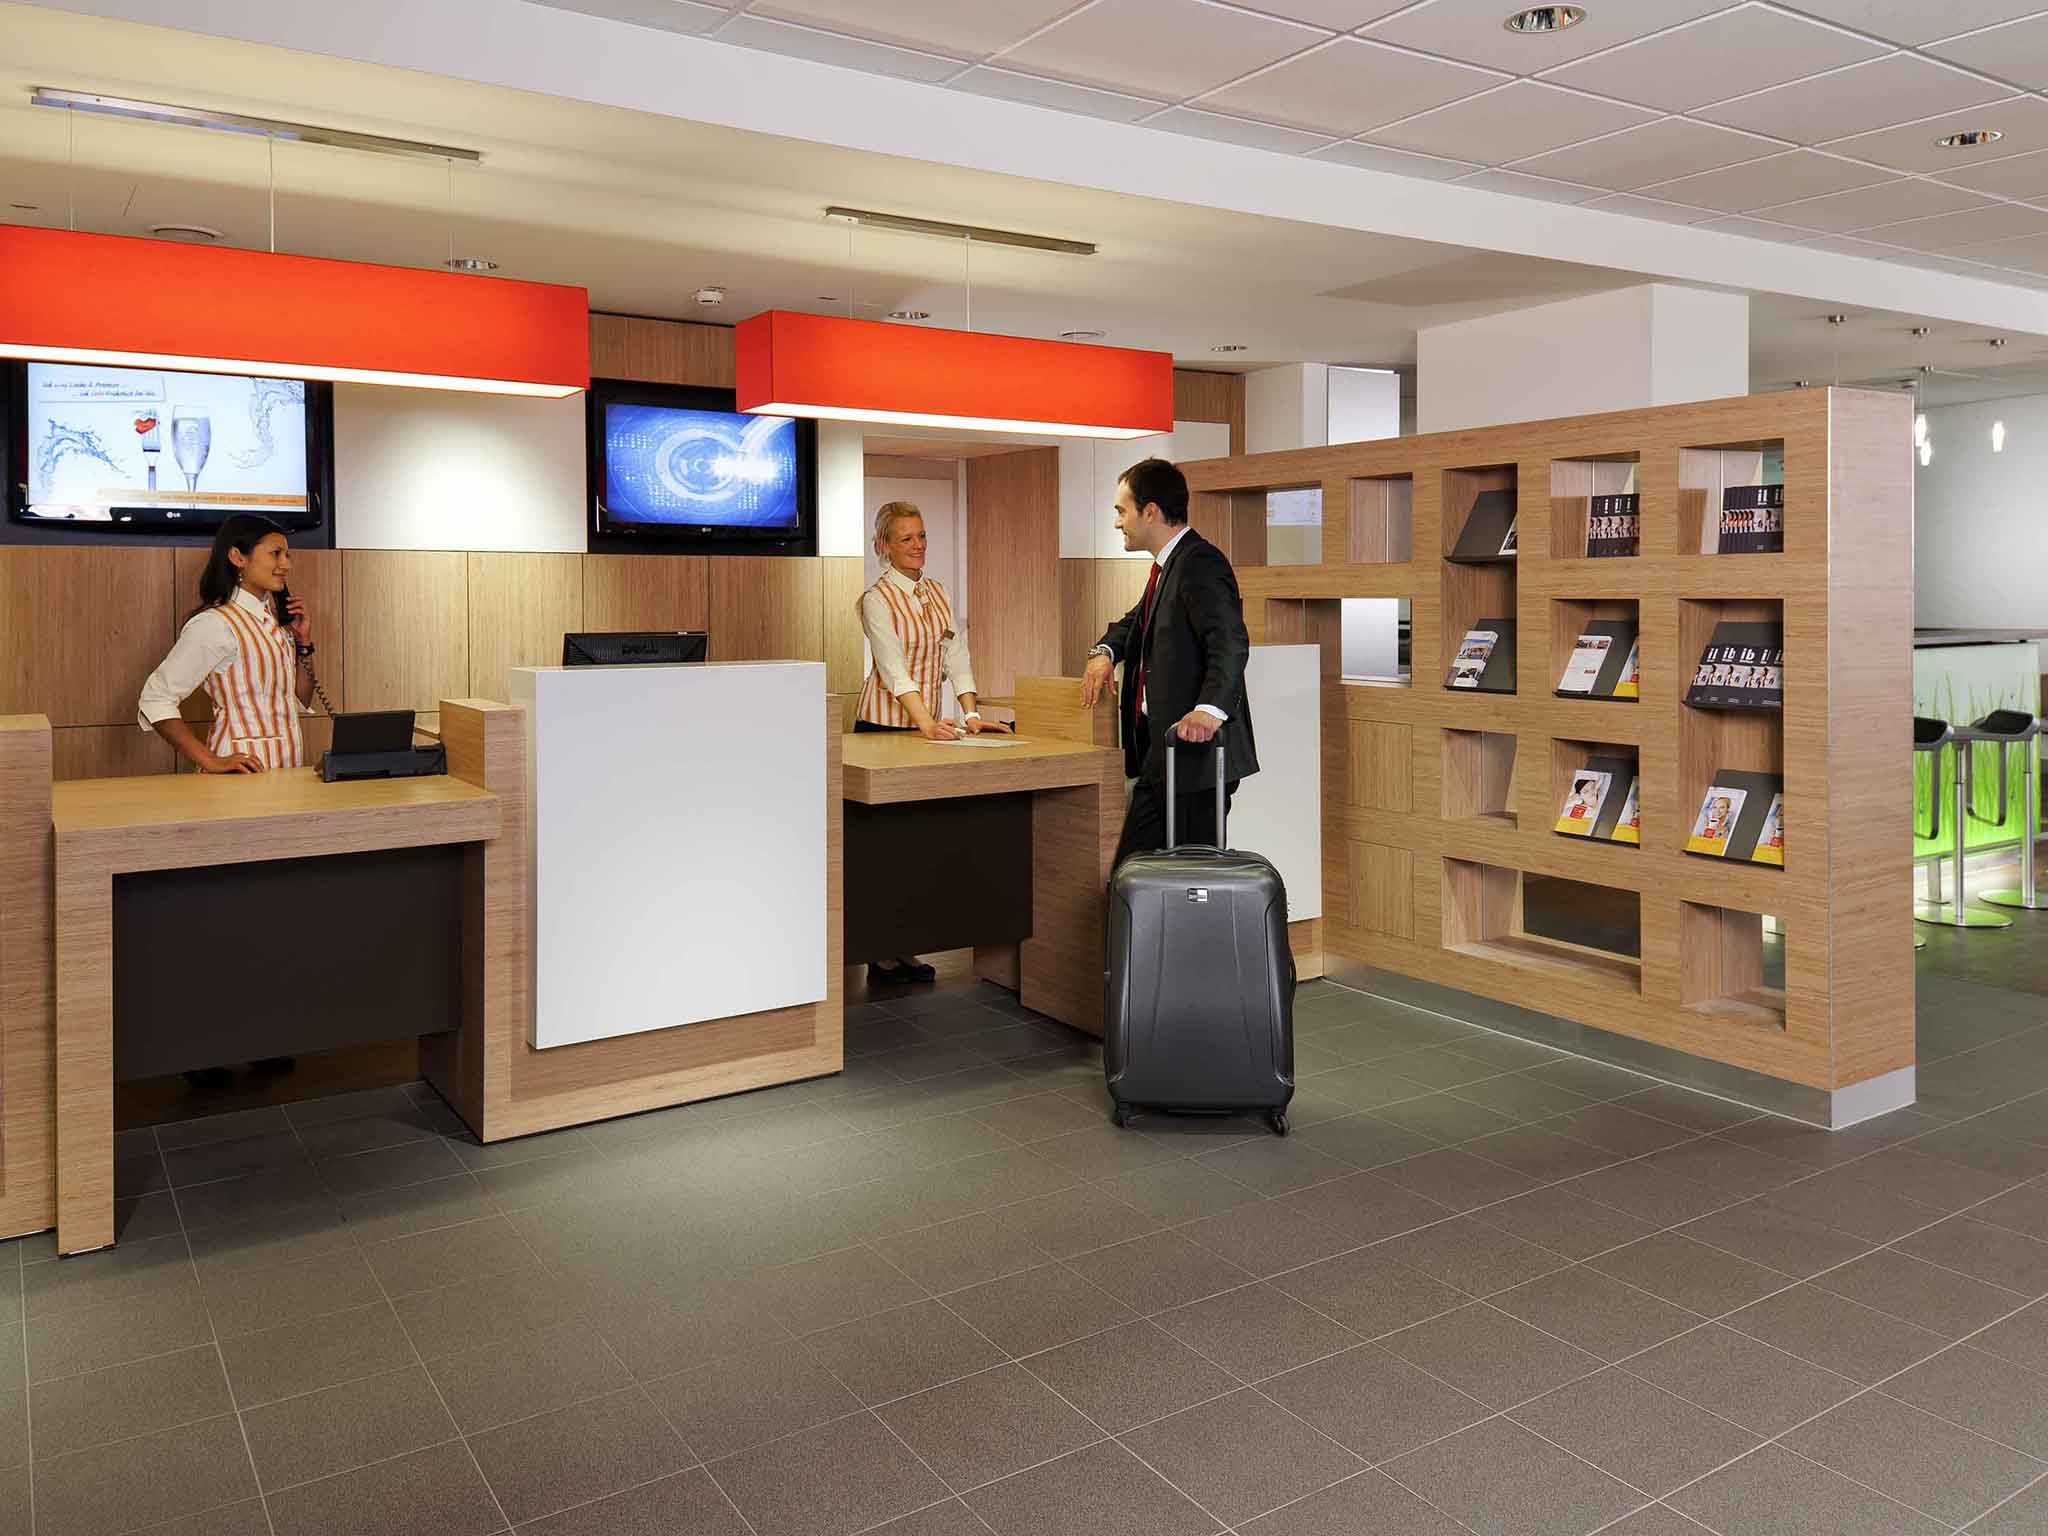 Hotel ibis Augsburg Hauptbahnhof Book online now Wifi